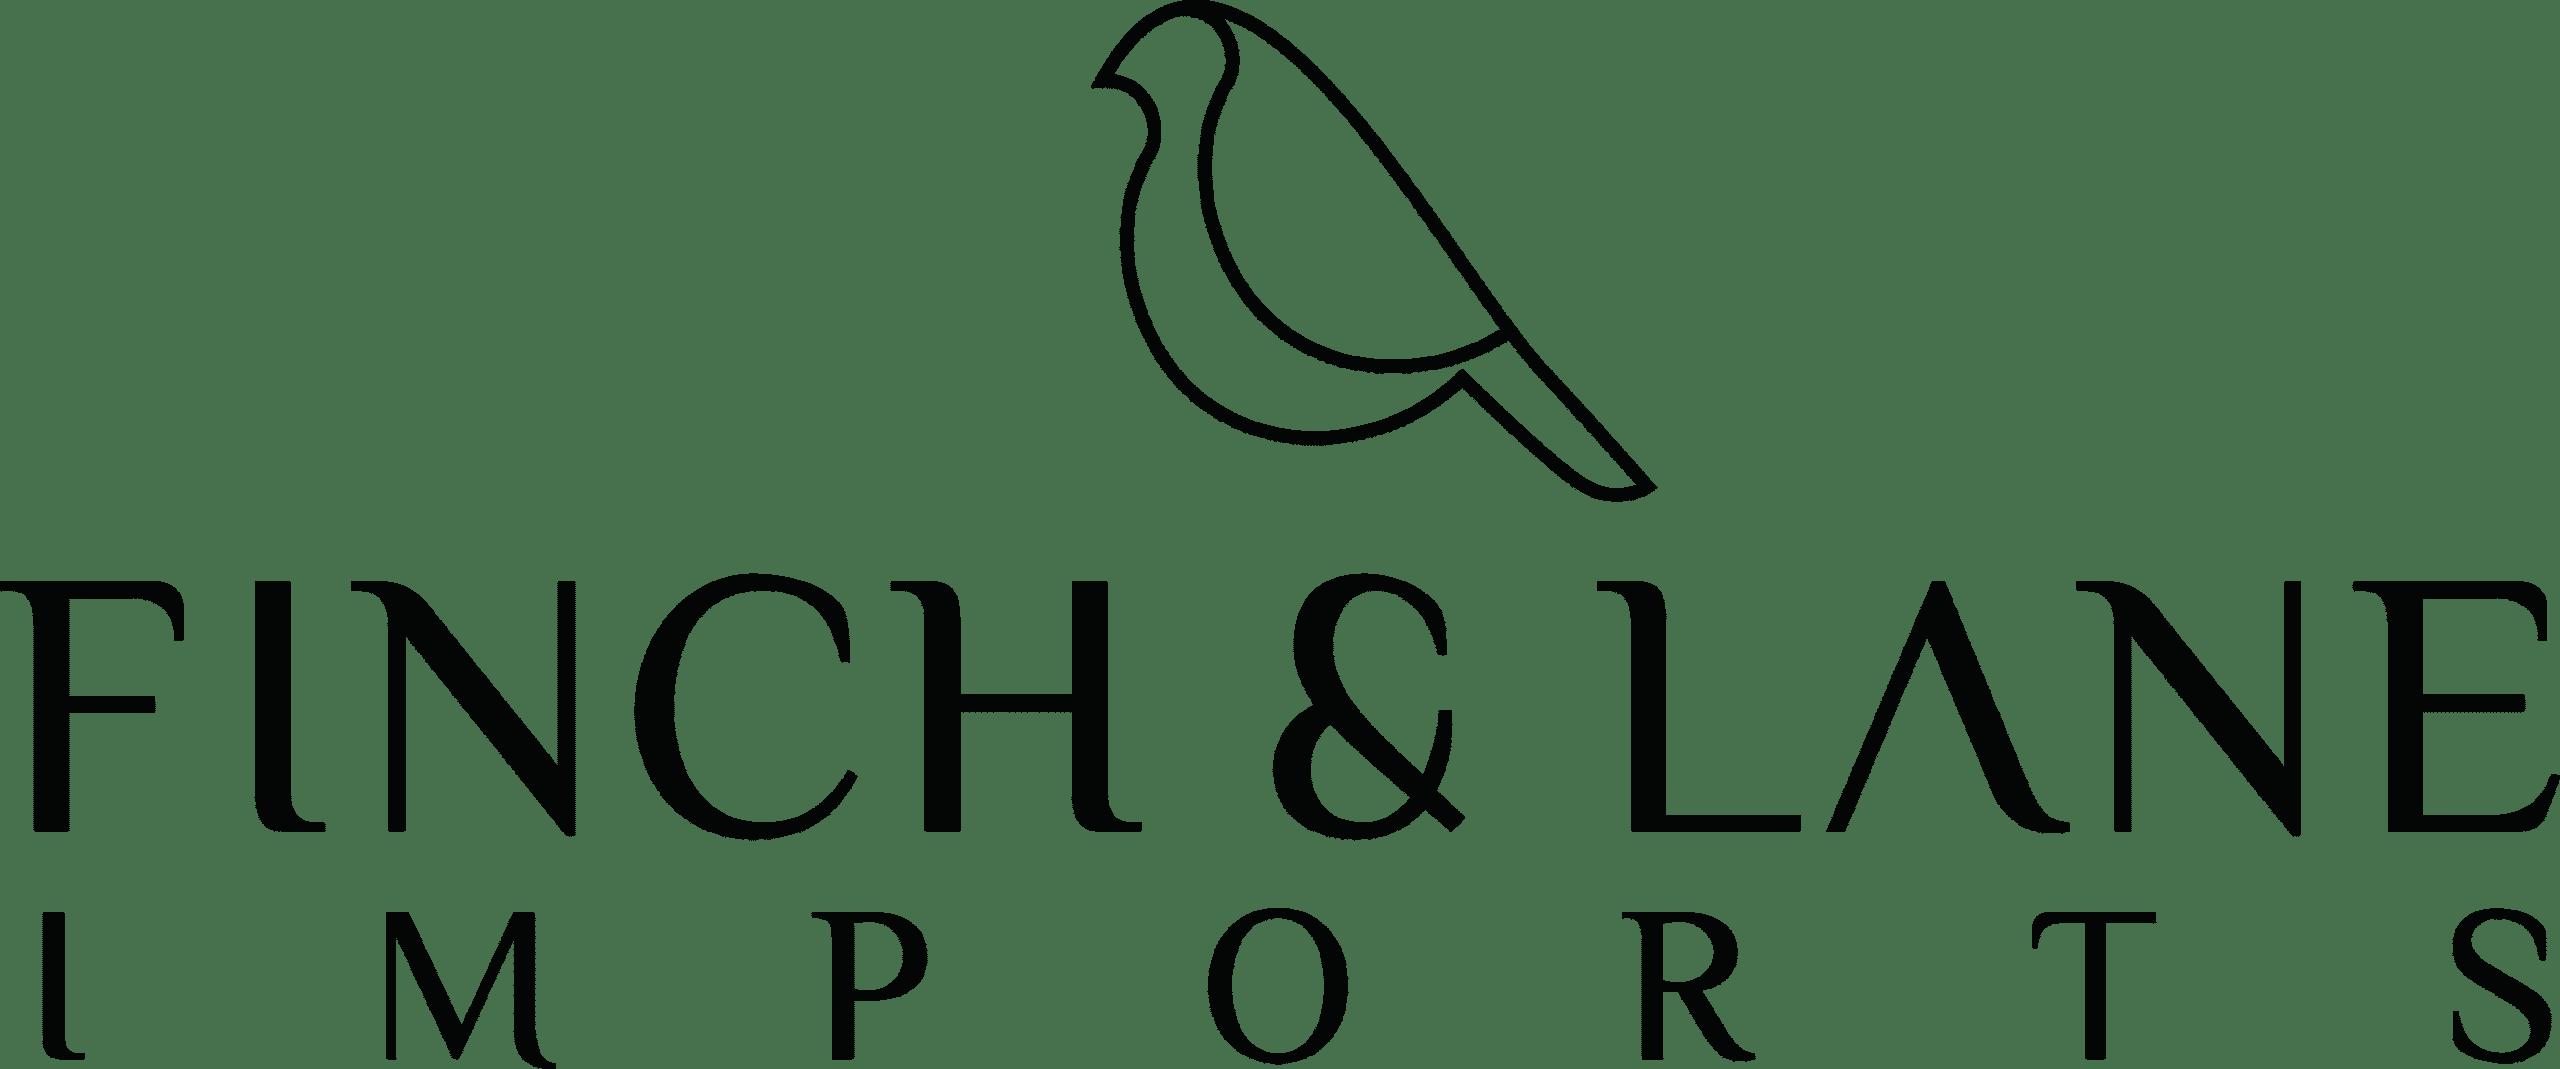 Finch & Lane Imports